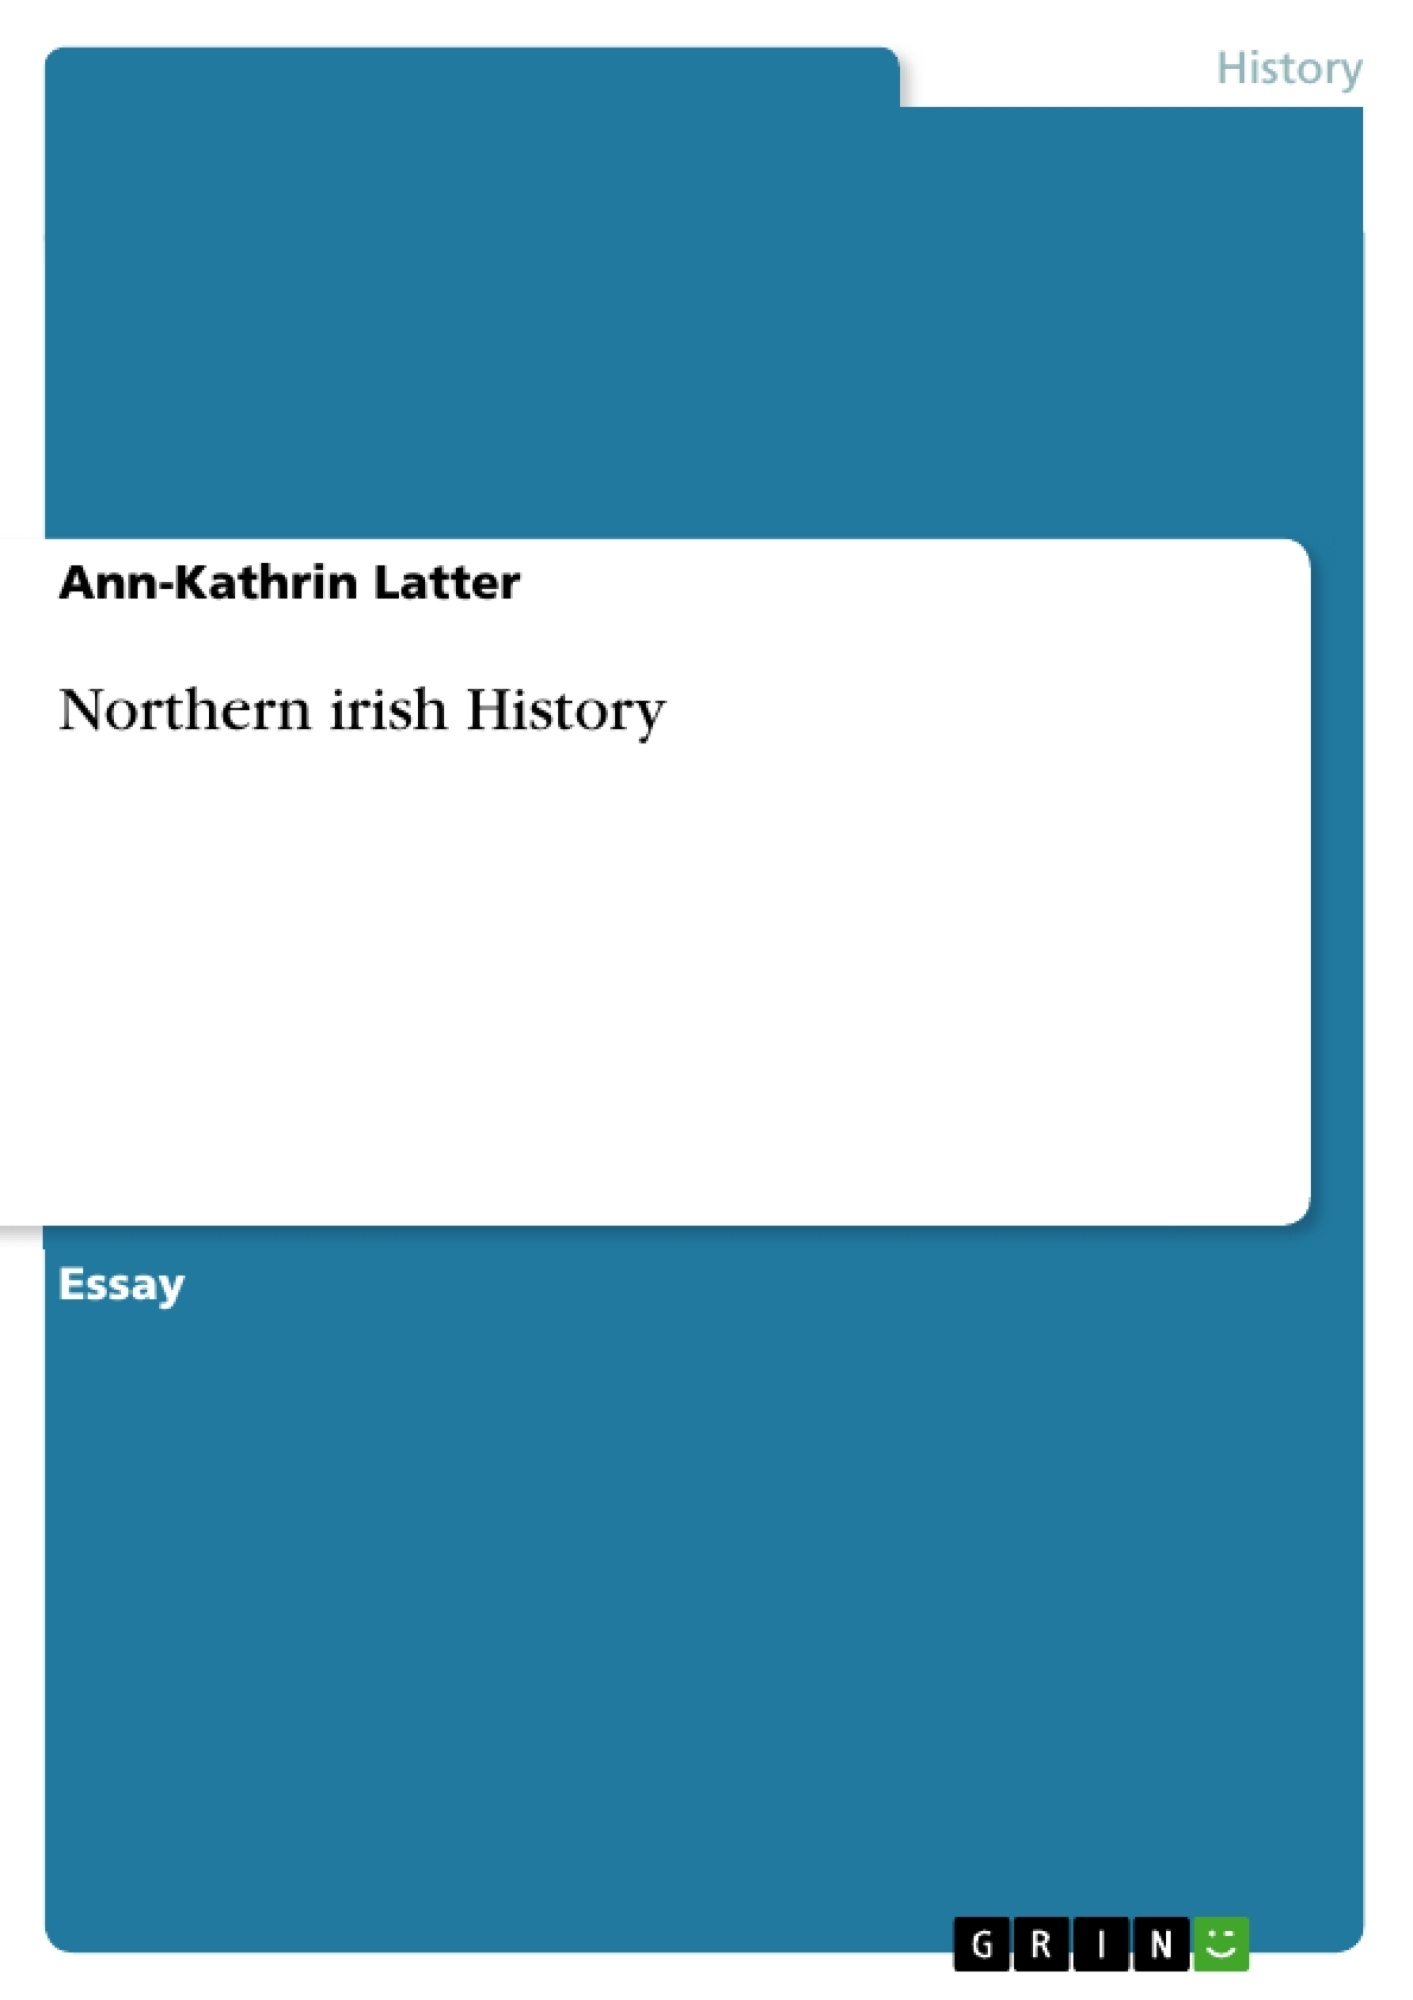 Title: Northern irish History